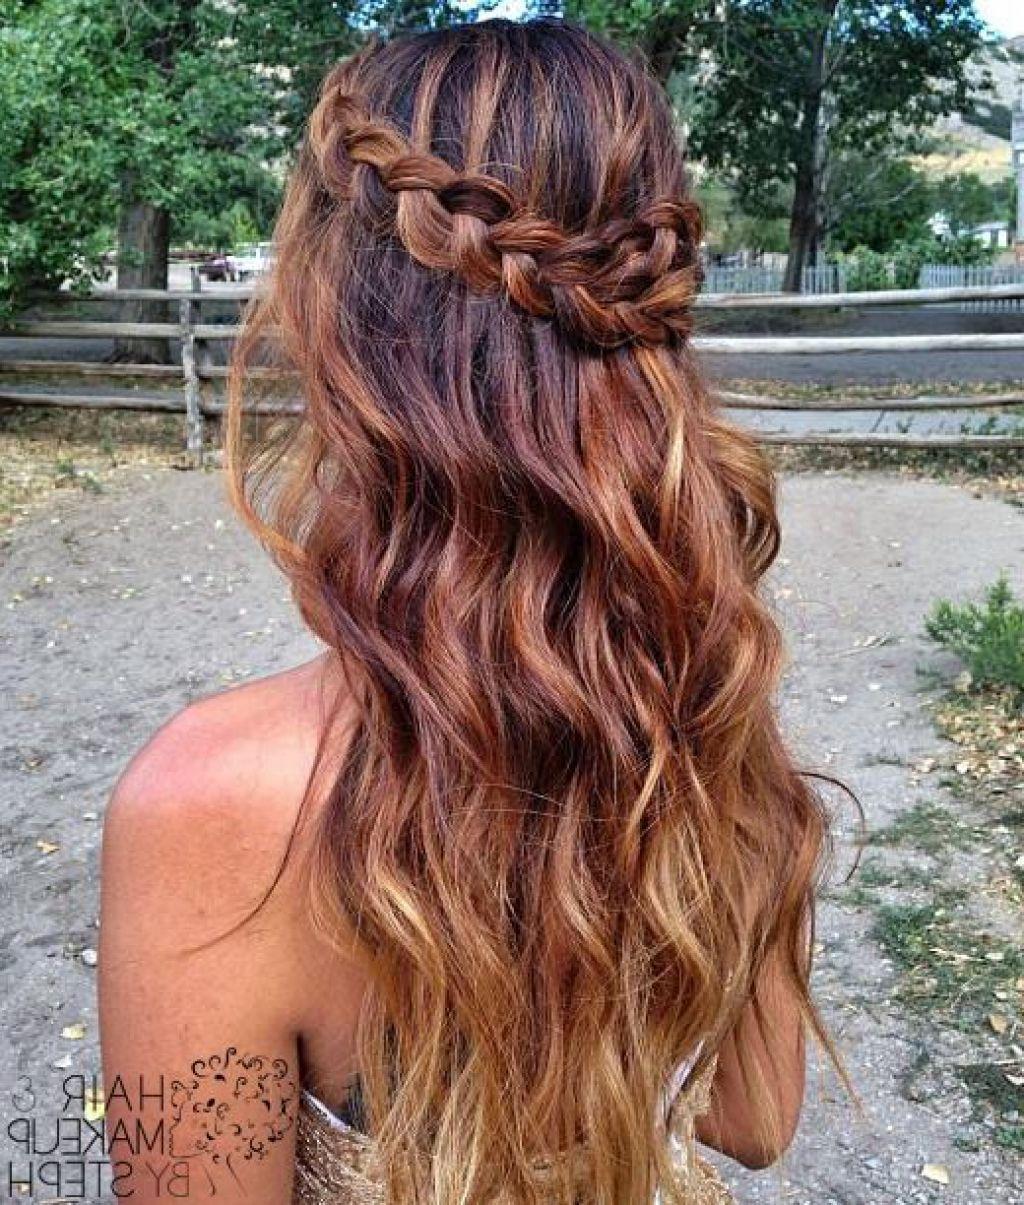 Homecoming Hairstyles Half Up Half Down Braid Valoblogi Com